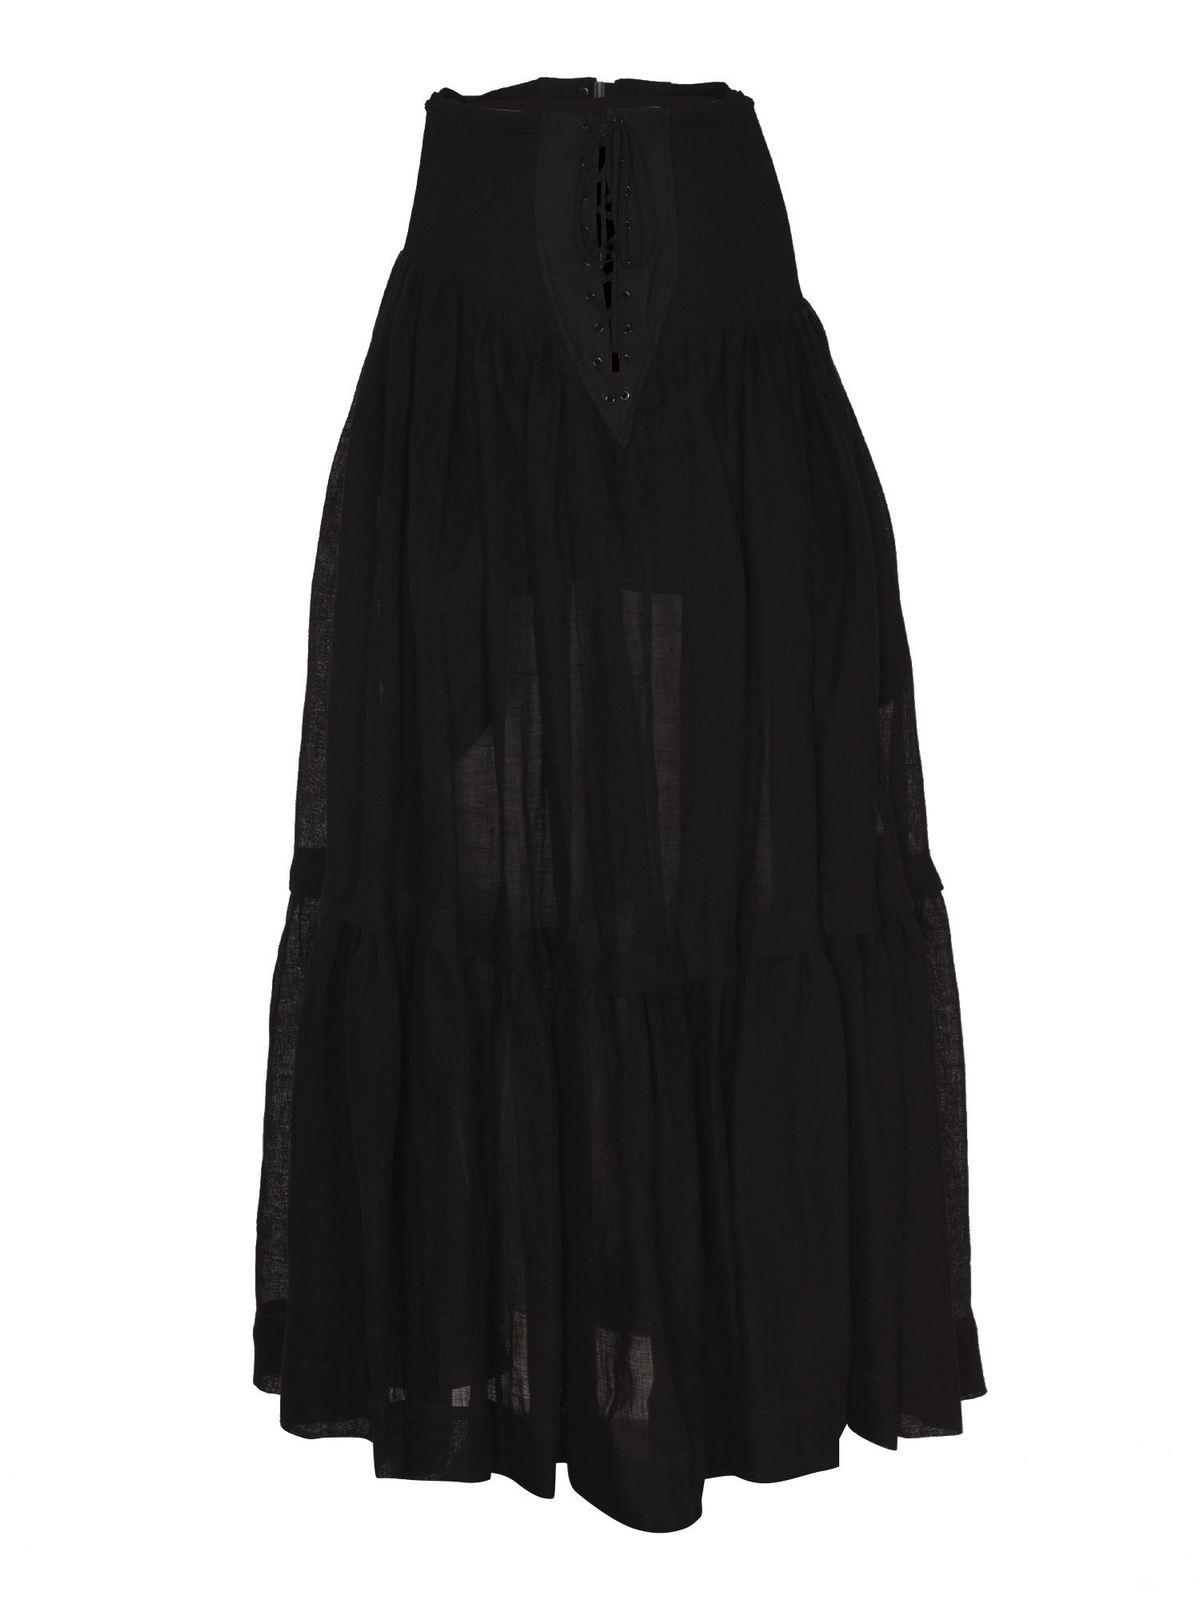 Alberta Ferretti Linens FLOUNCED SKIRT IN BLACK